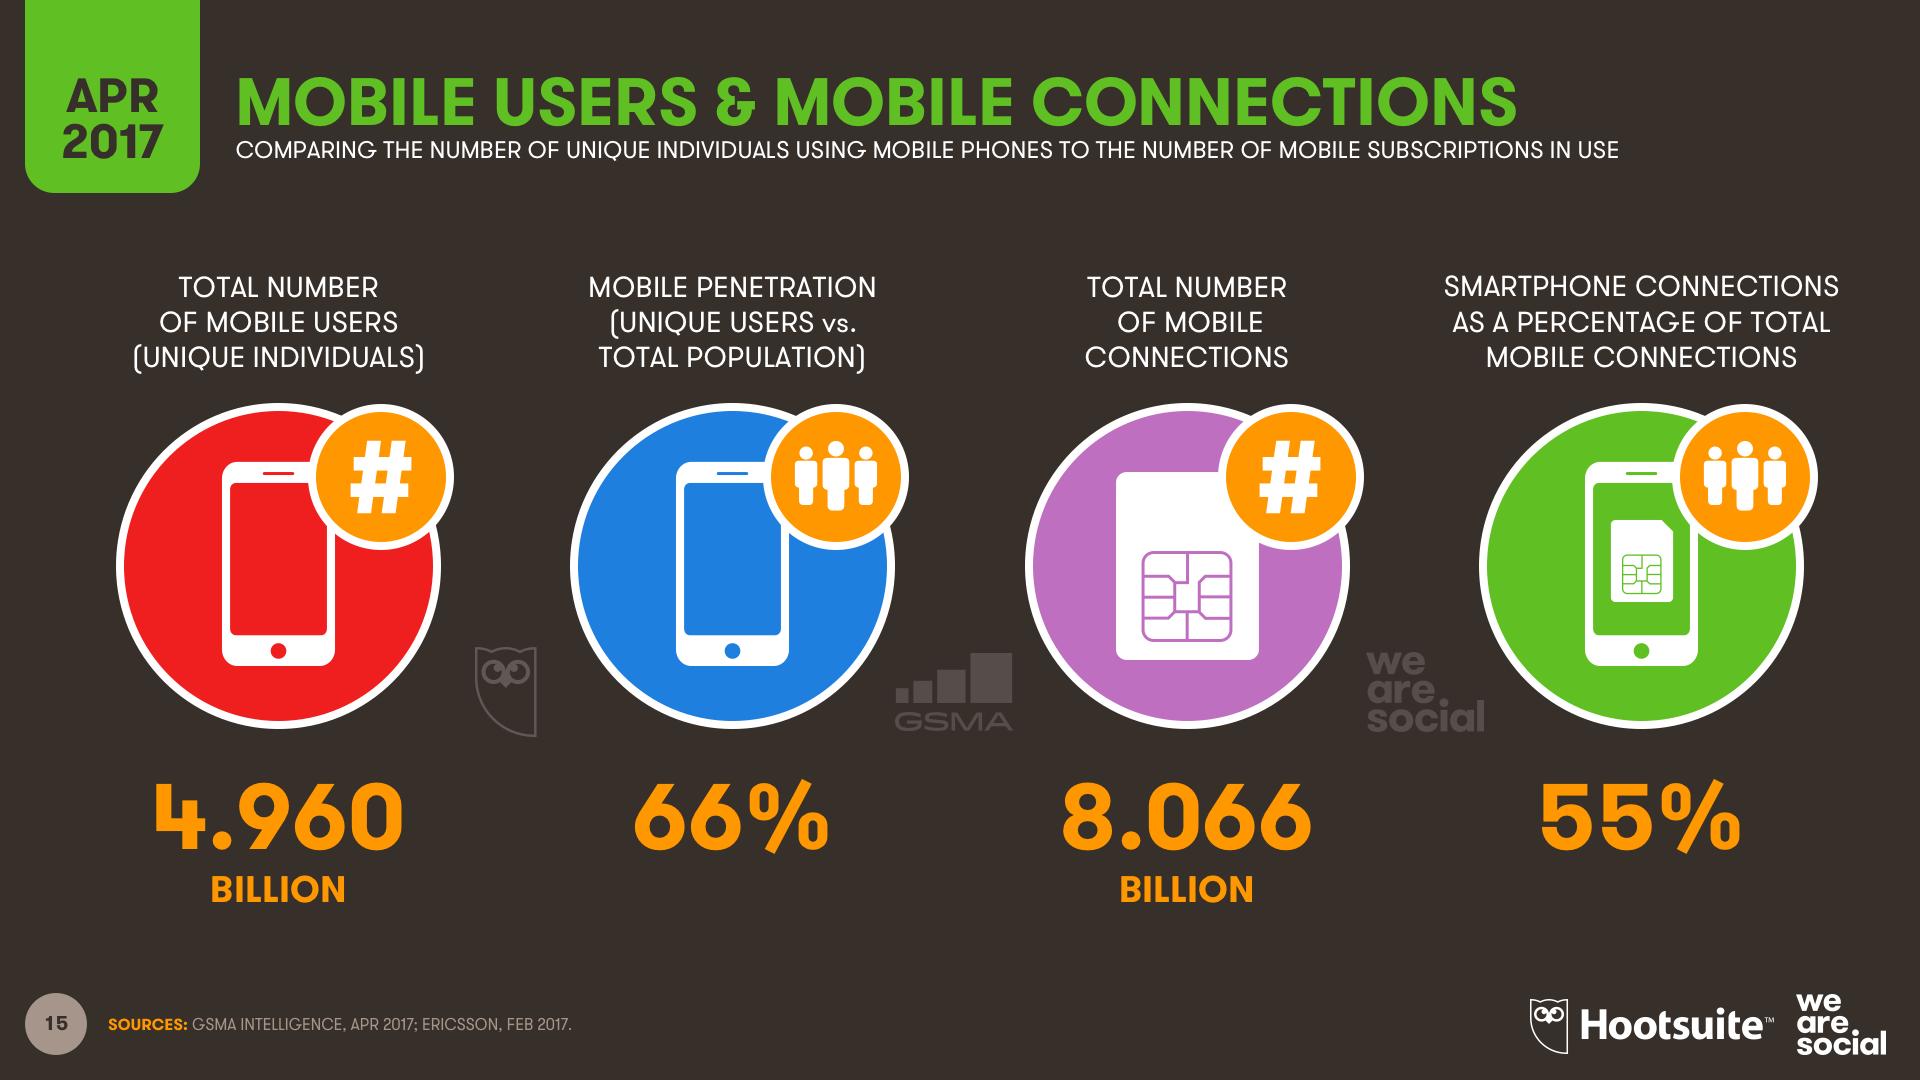 Global mobile penetration